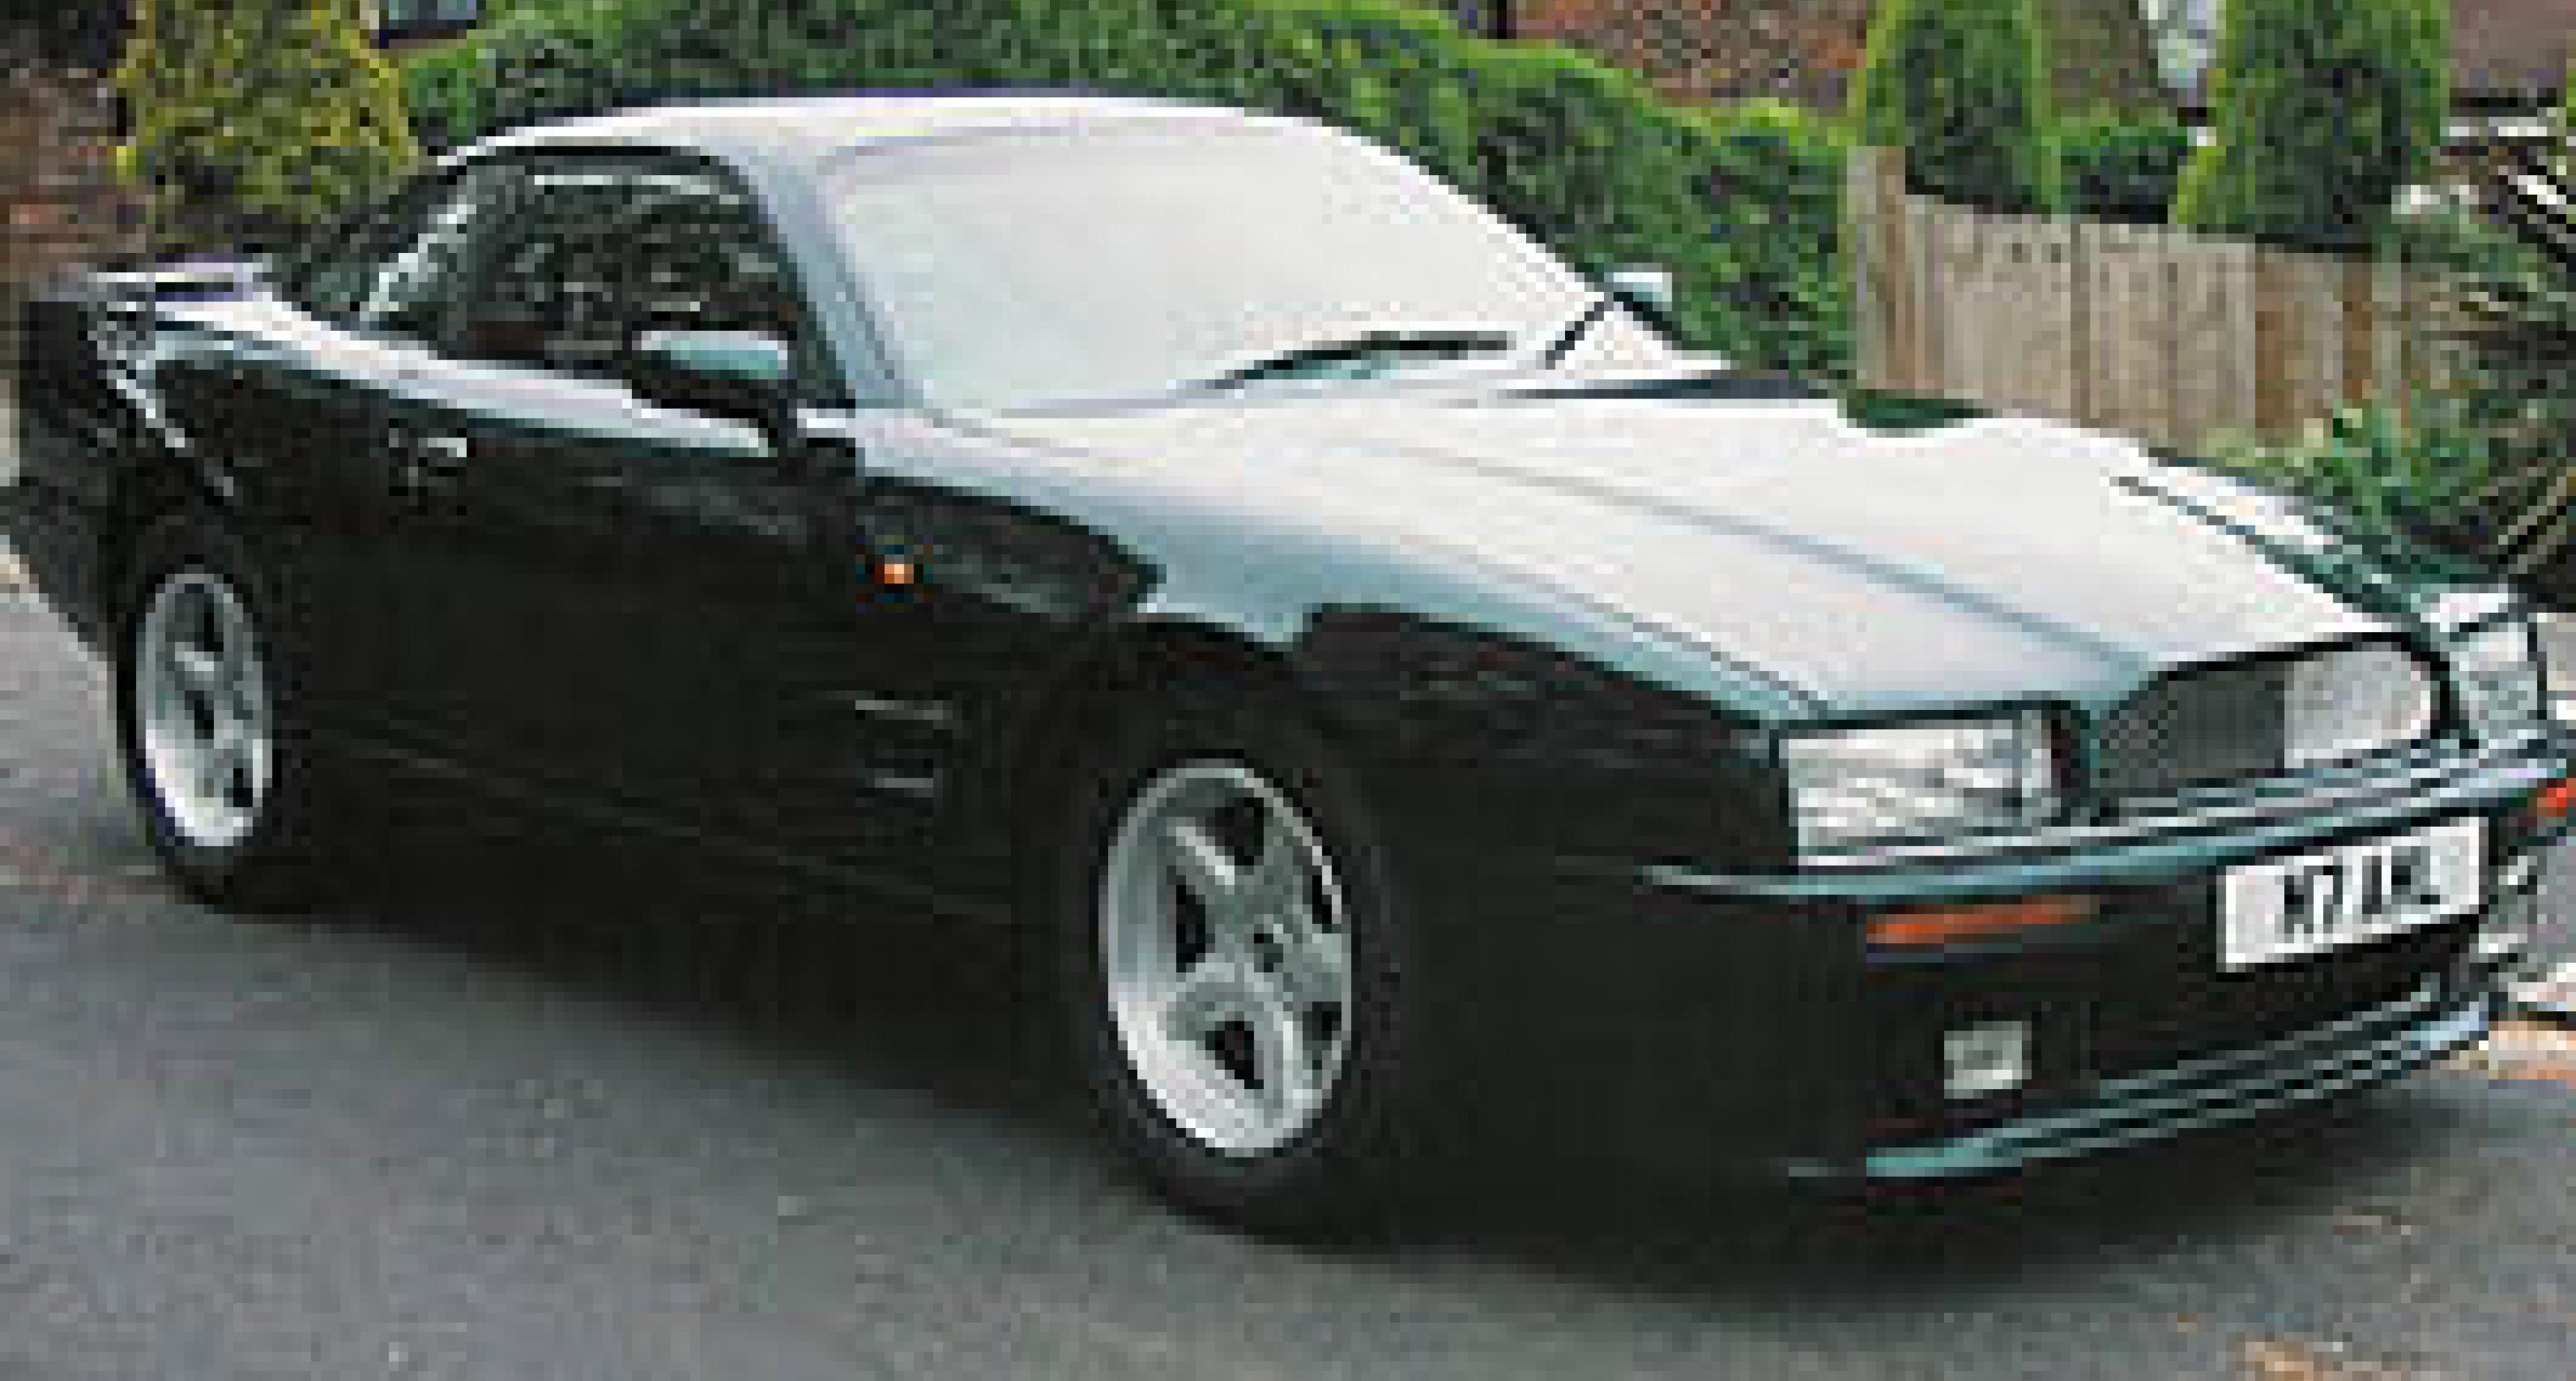 Bonhams Aston Martin Auktion 2005 - Vorschau